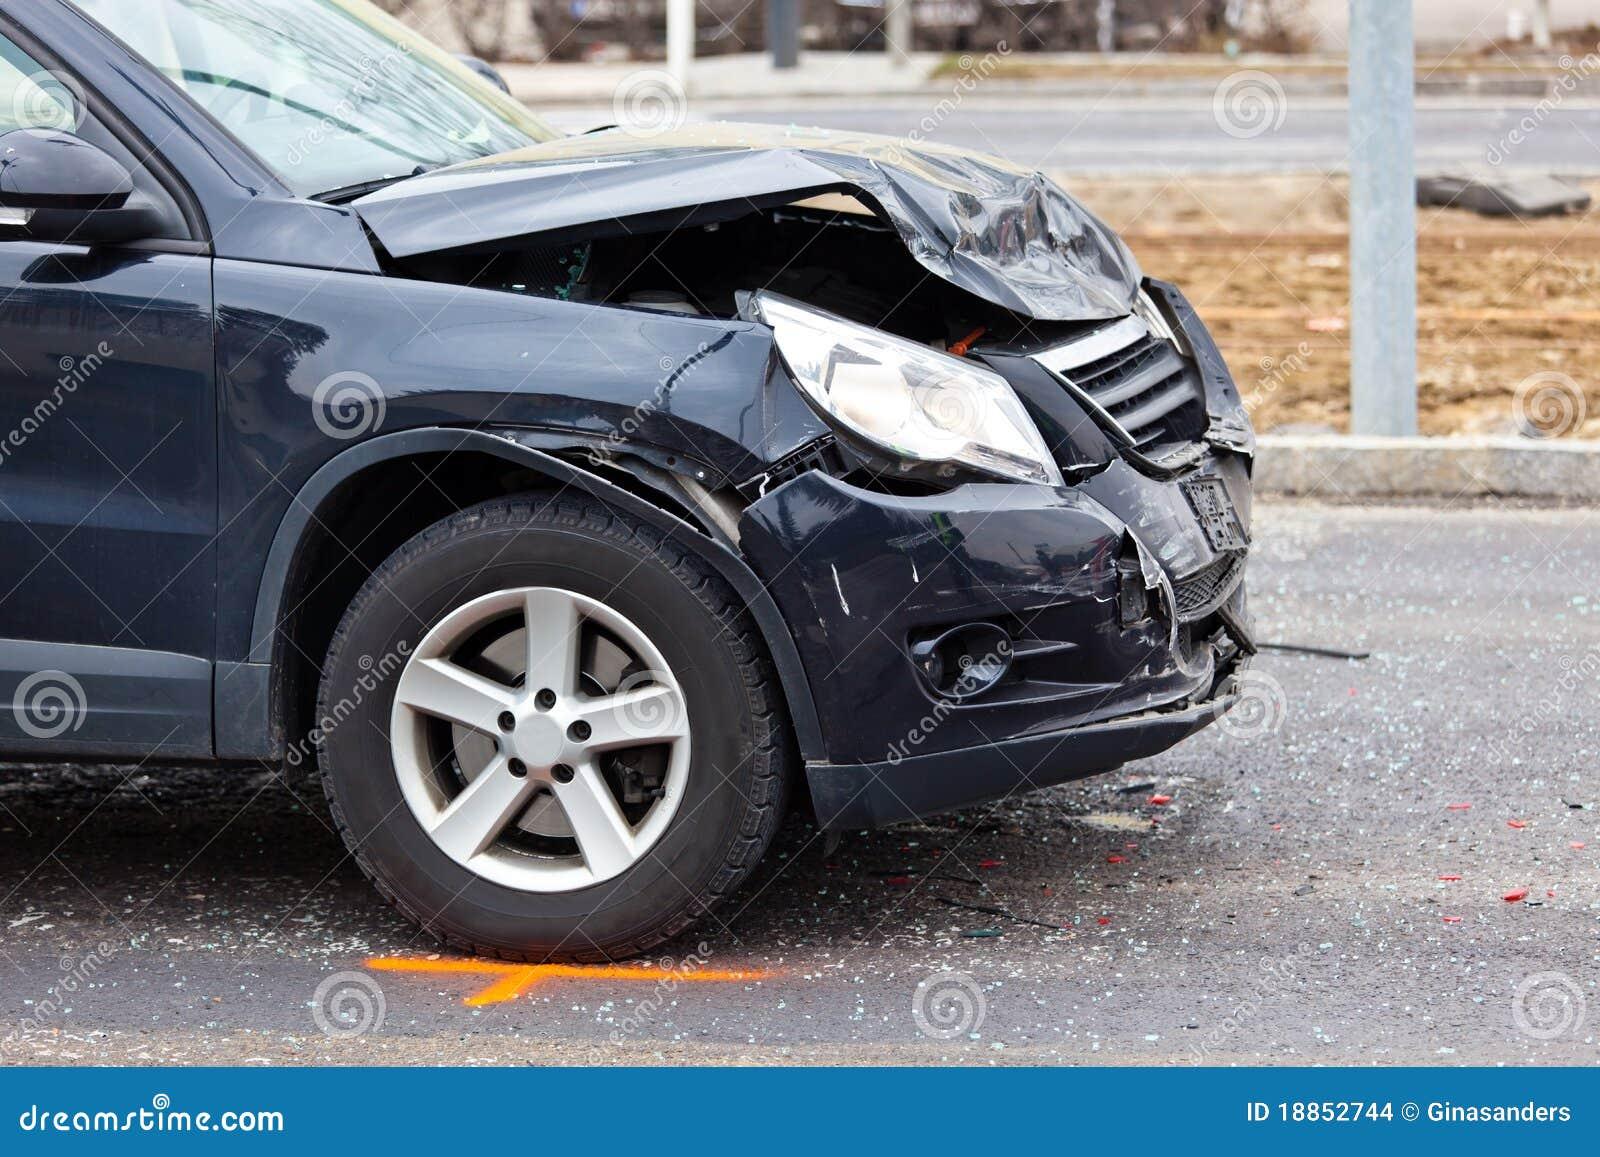 Car Insurance Premium After Accident